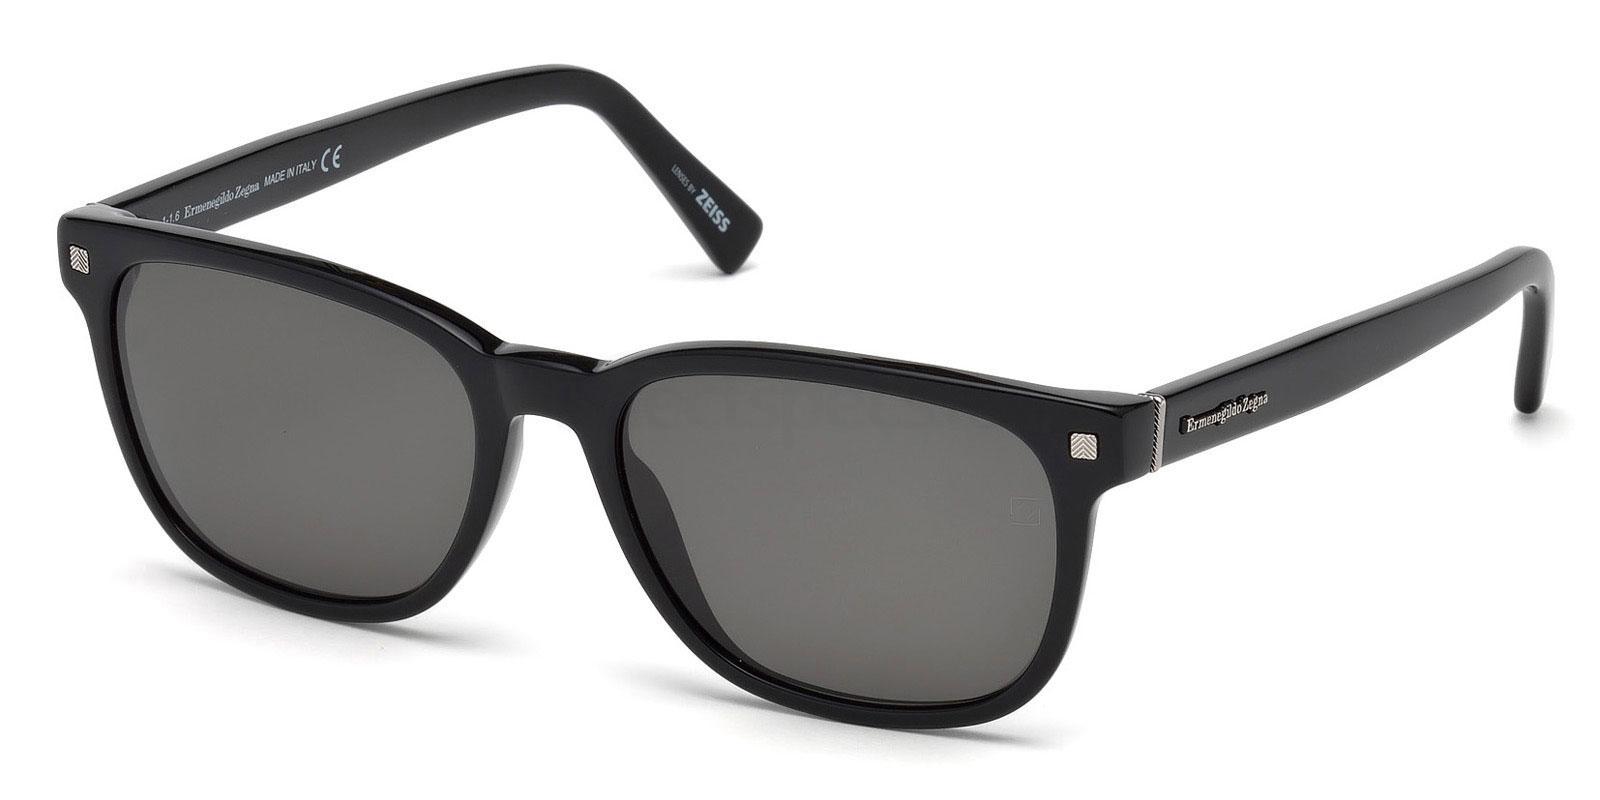 01D EZ0075 Sunglasses, Ermenegildo Zegna